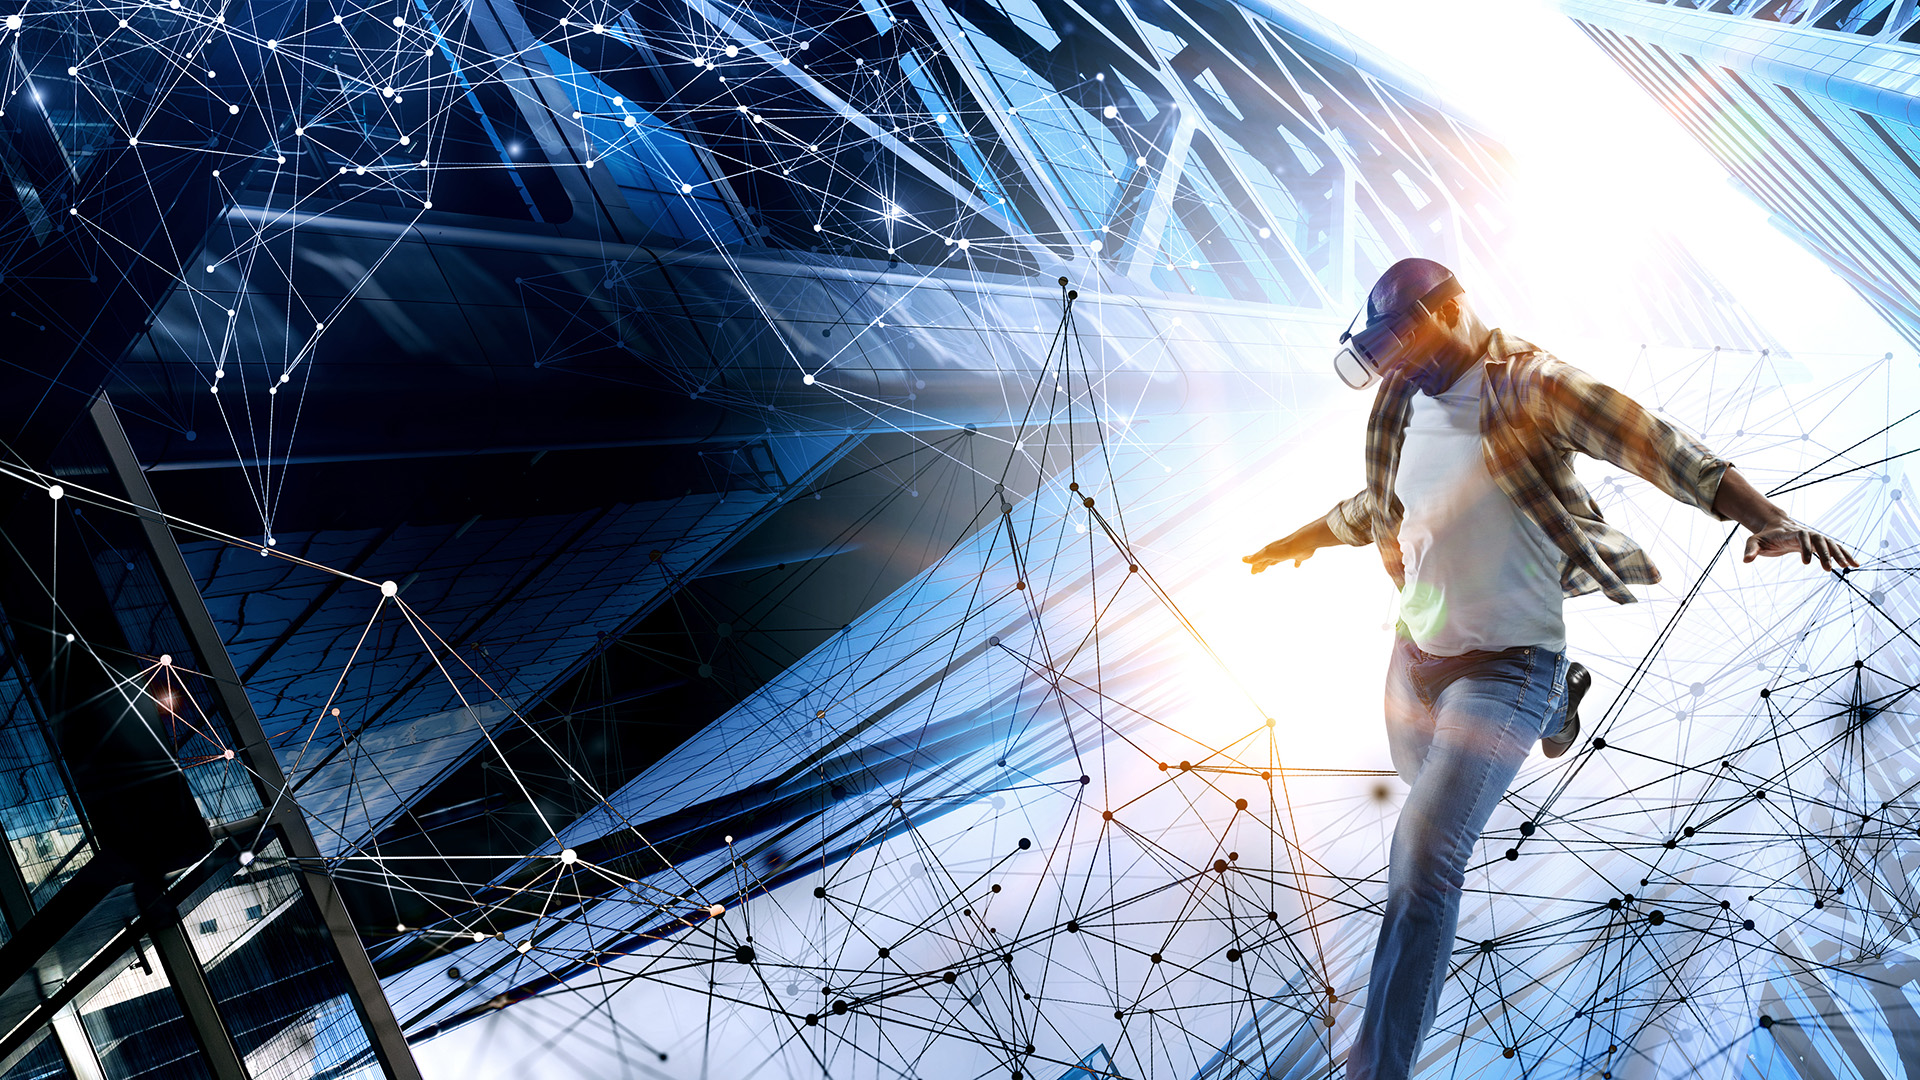 VR user kicking virtual ball into the bright future on futuristic background